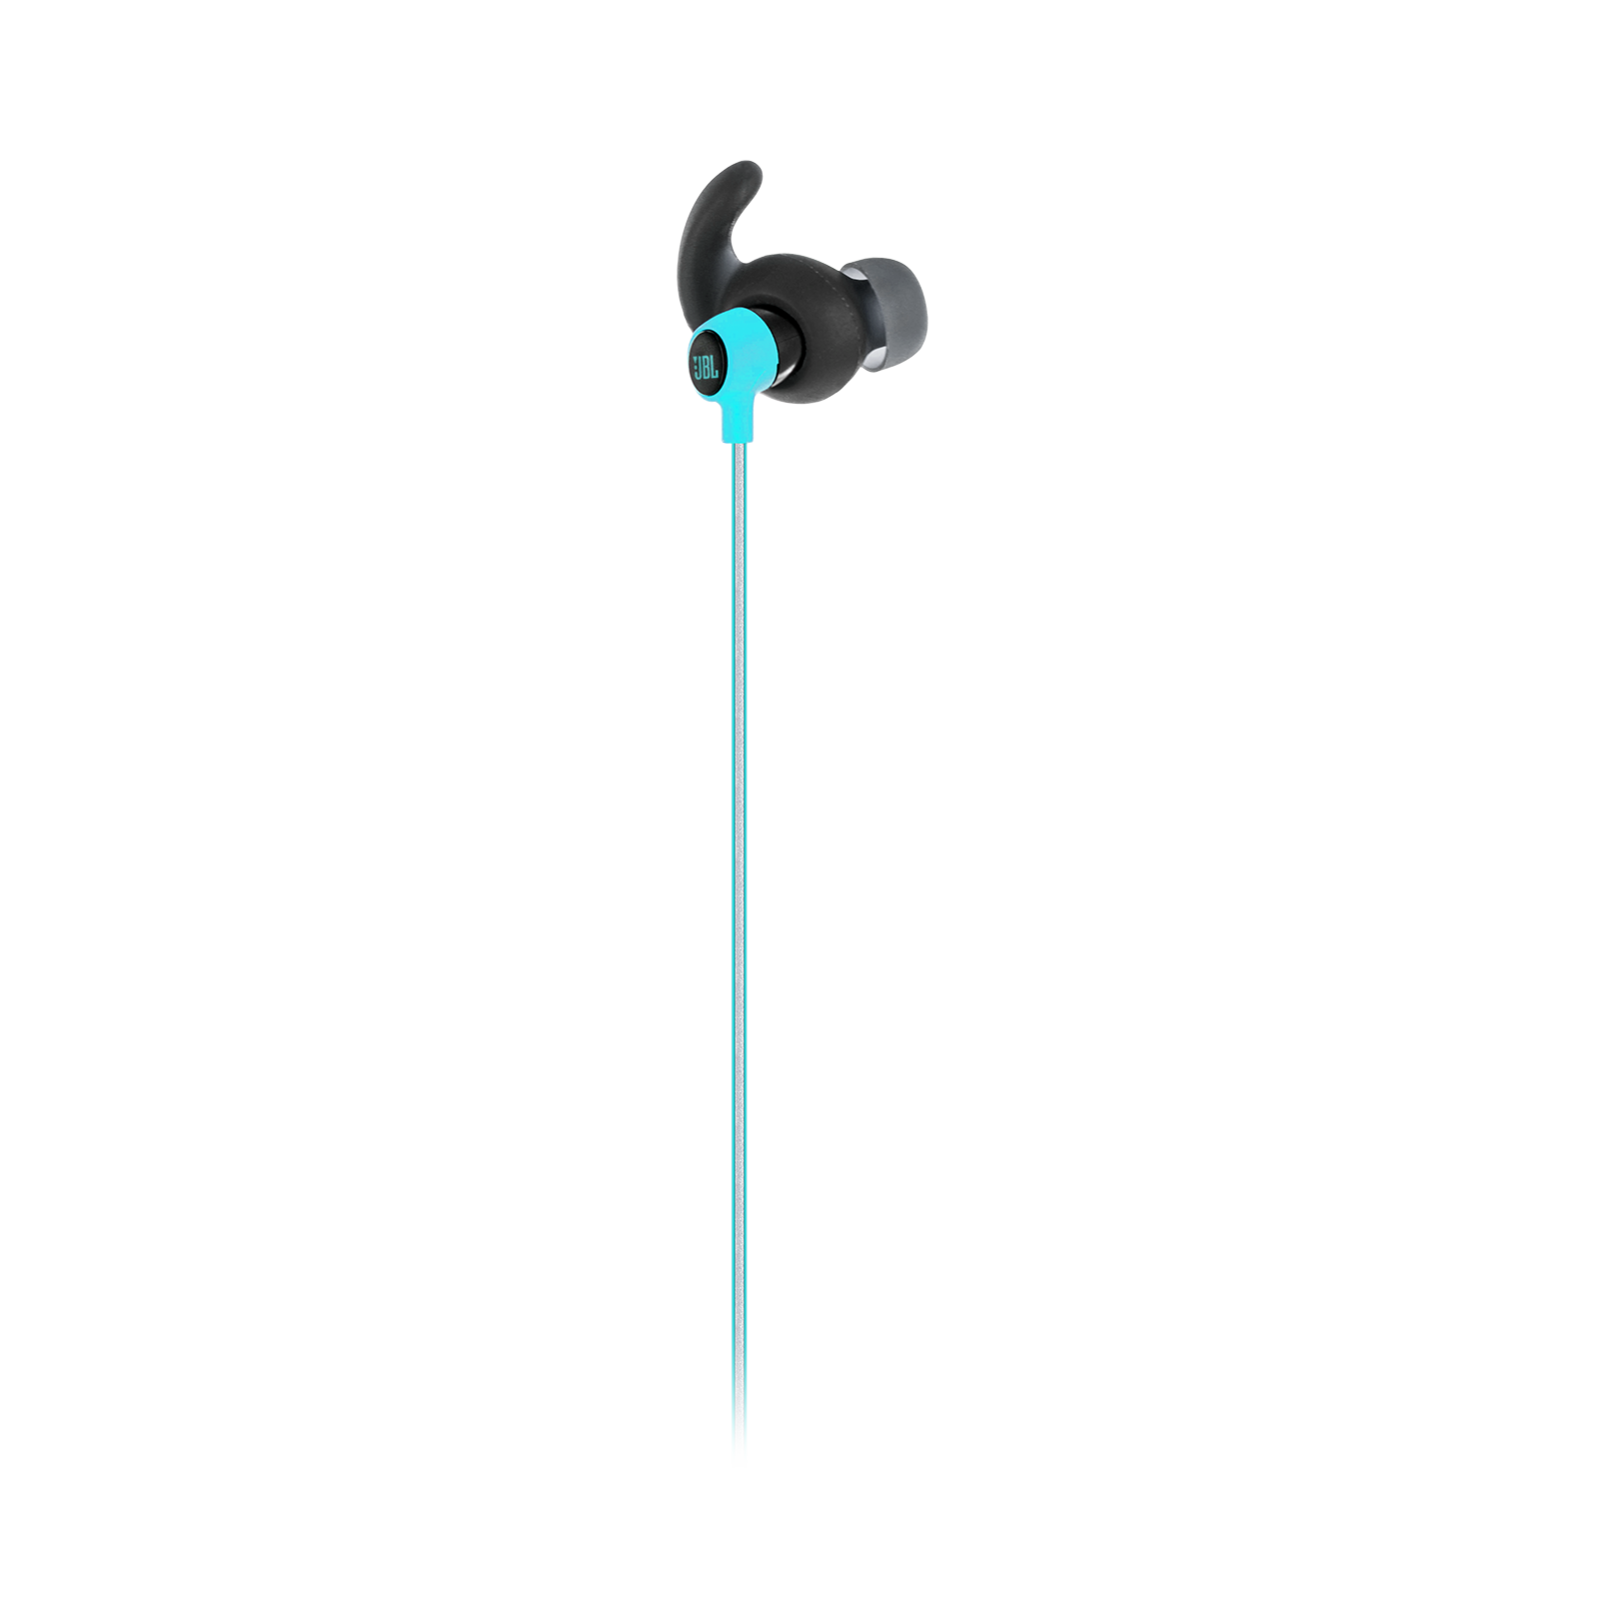 Reflect Mini - Teal - Lightweight, in-ear sport headphones - Detailshot 10